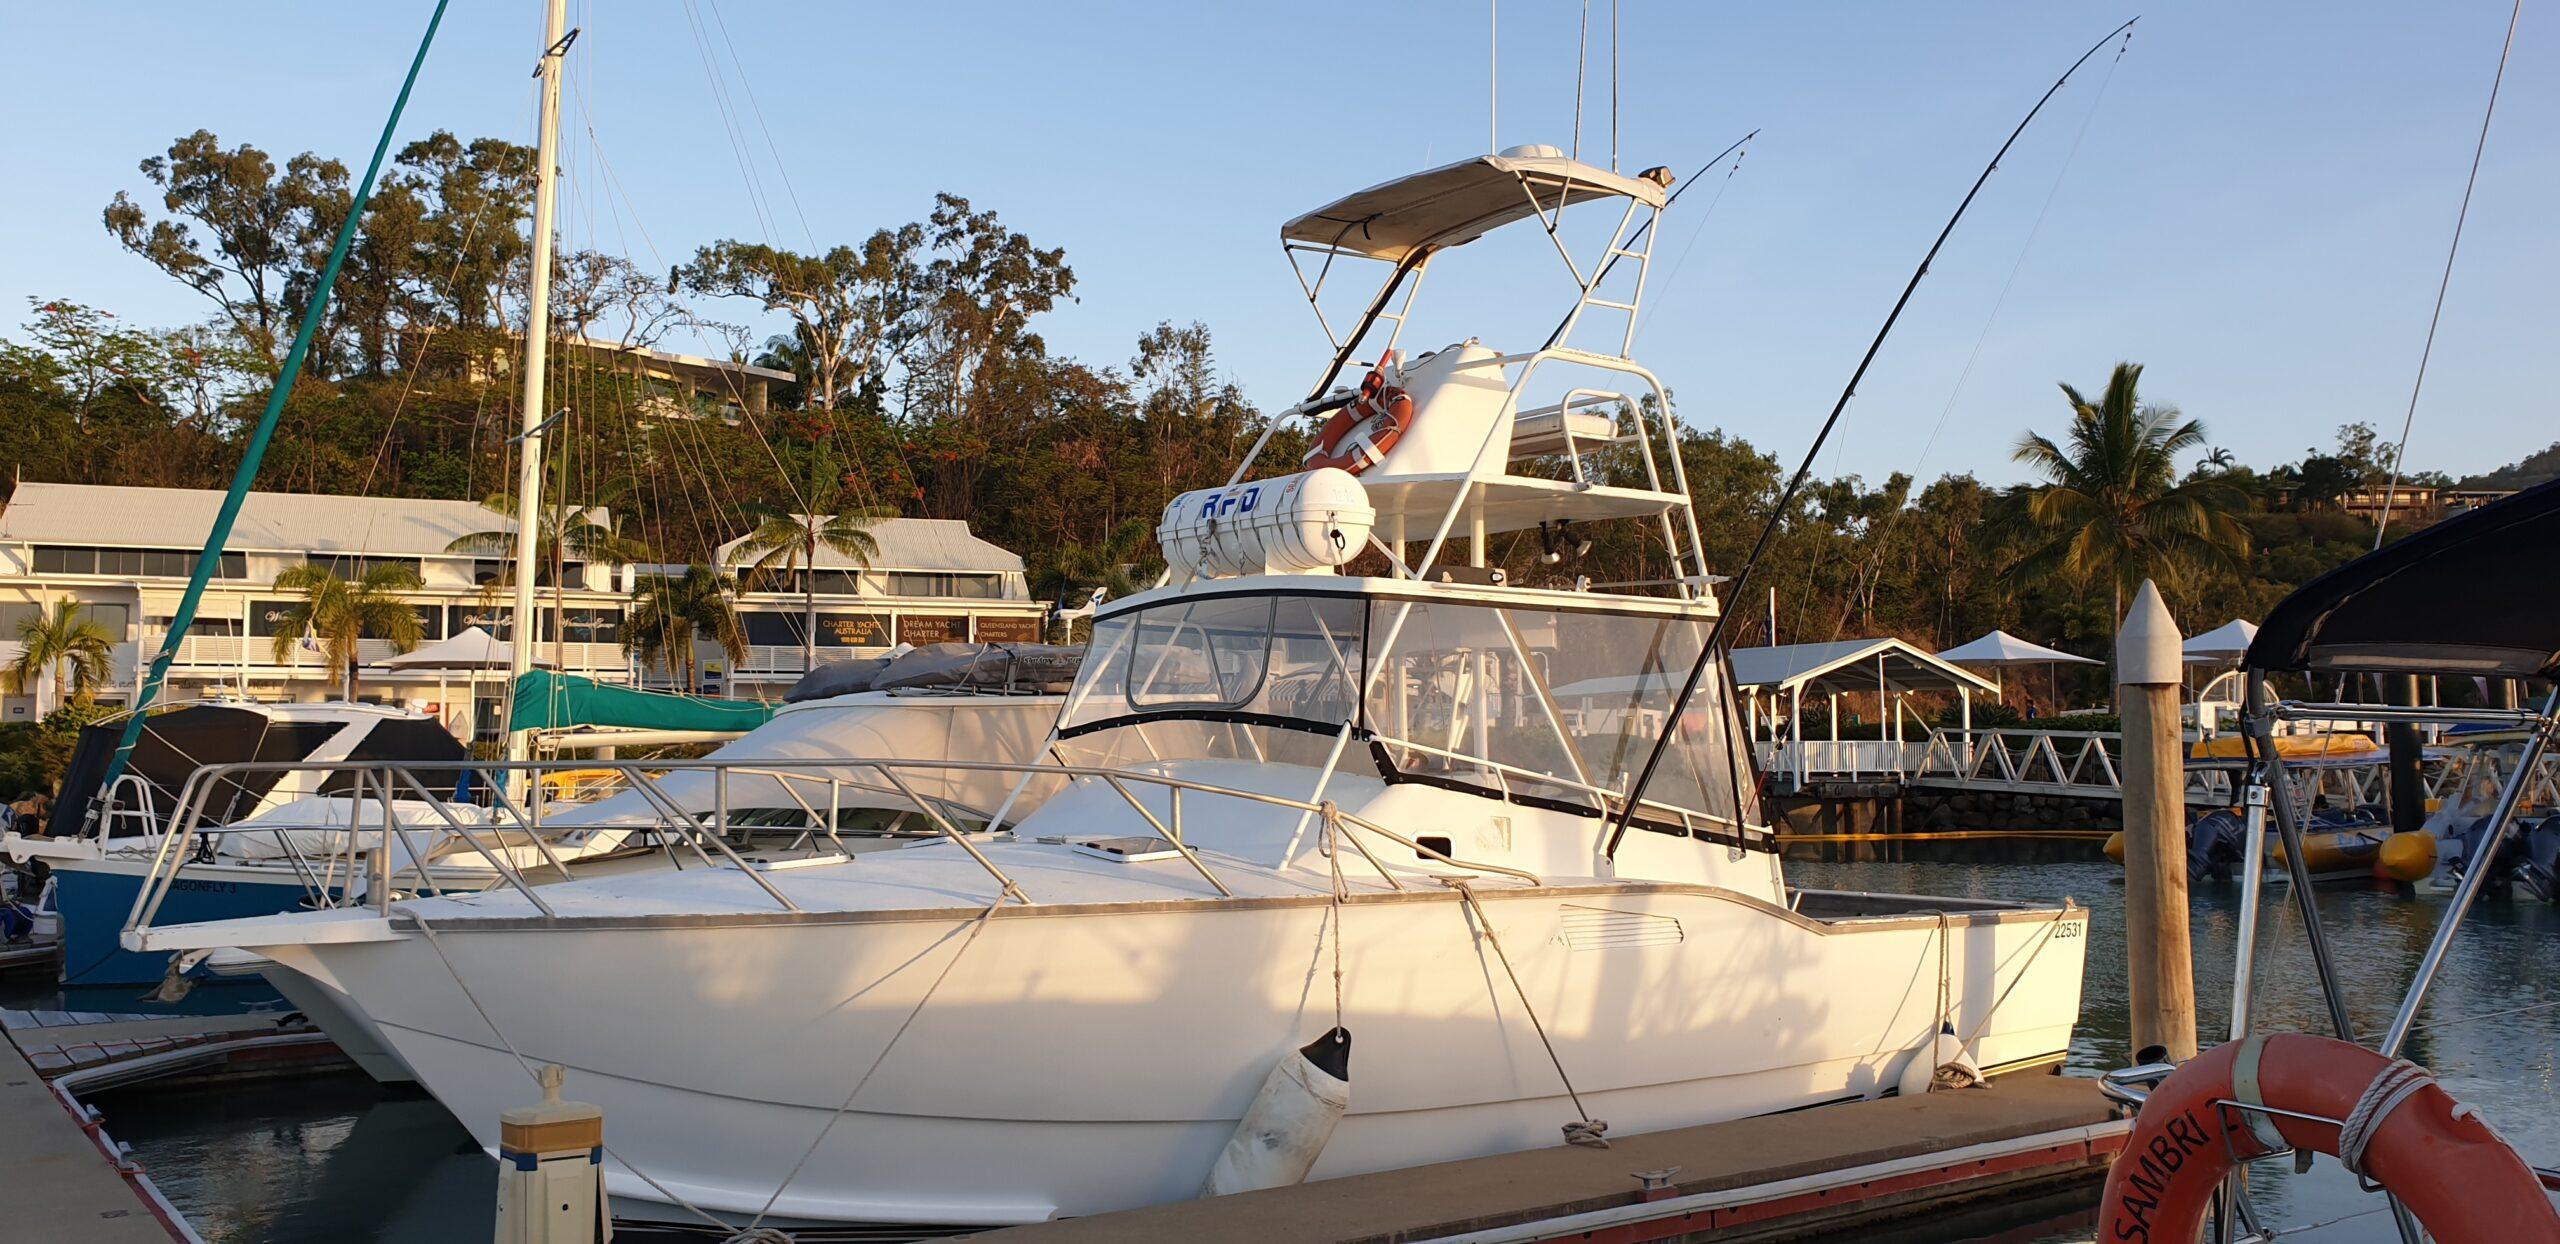 Morning Fishing Charter Whitsundays Airlie Beach